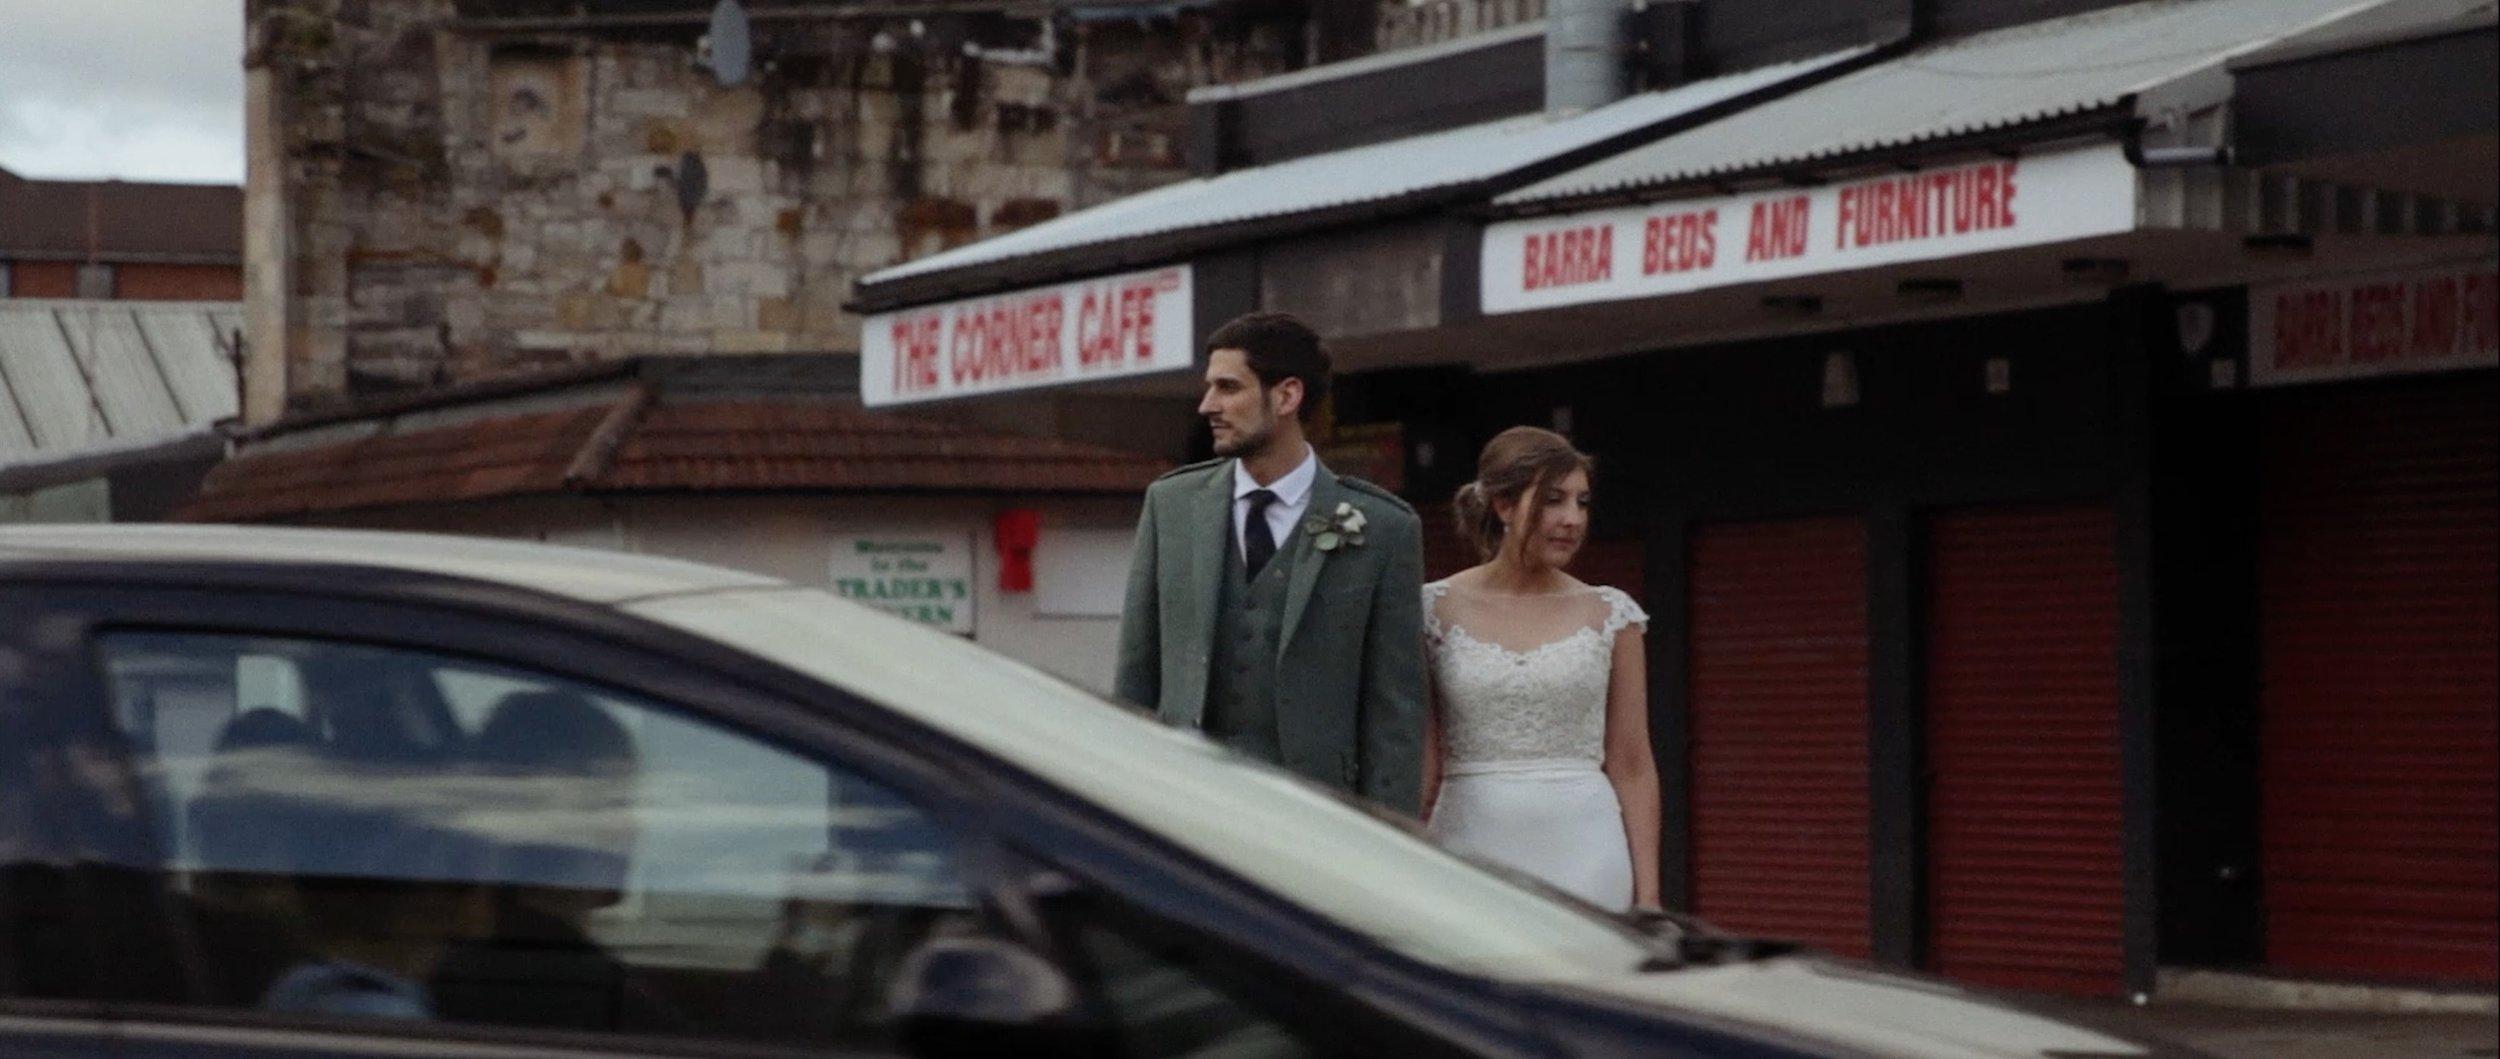 cardross-estate-wedding-videographer_LL_05.jpg